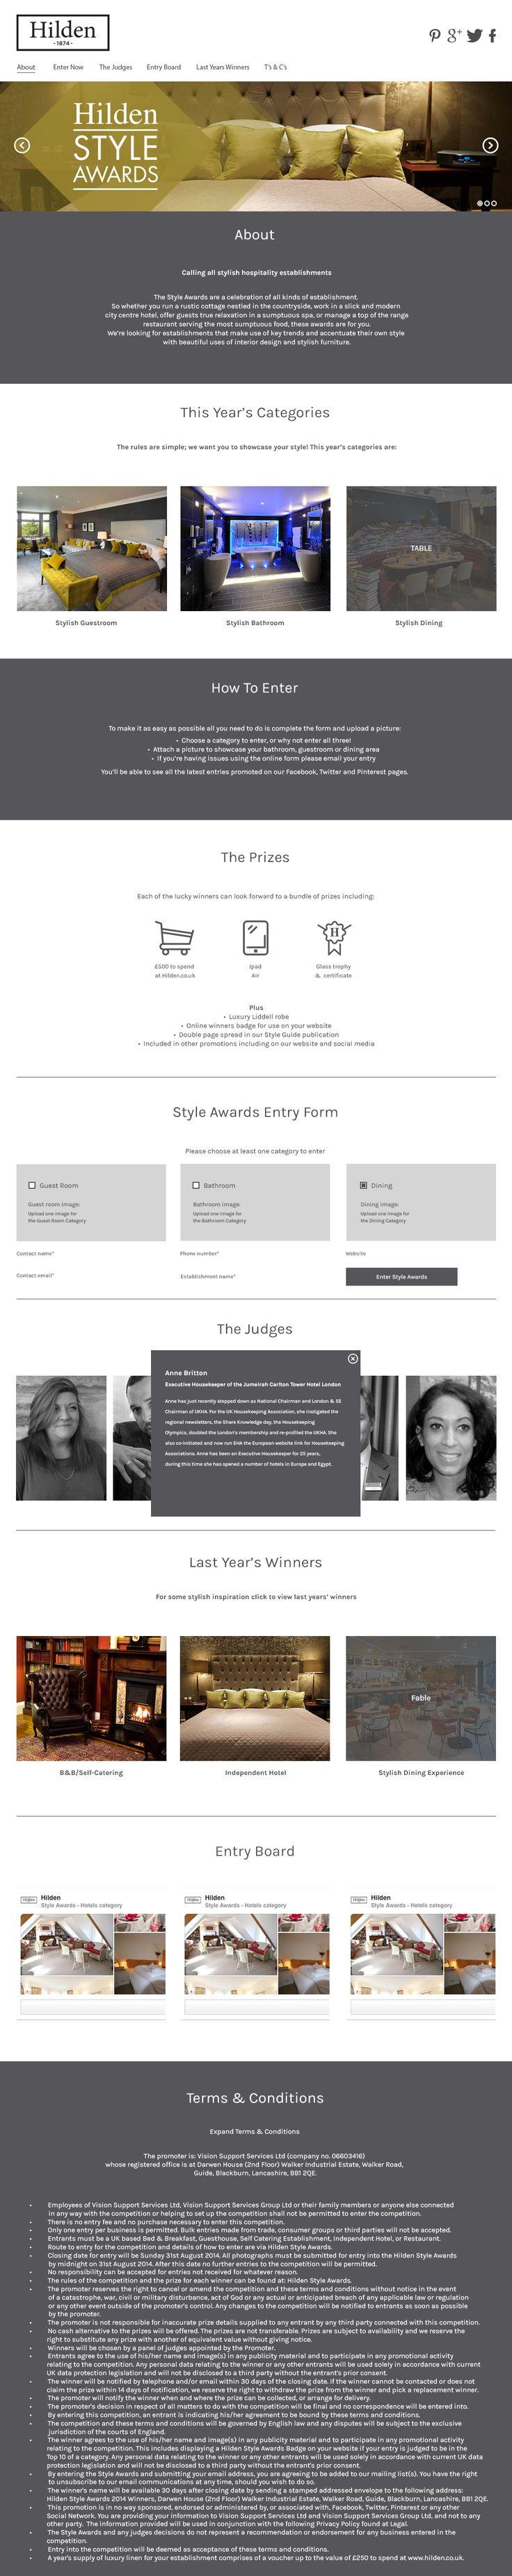 Web design for the annual Hilden Style Awards  Interior design, Hospitality.  Designer: Michael Court http://michaelcourt.co.uk